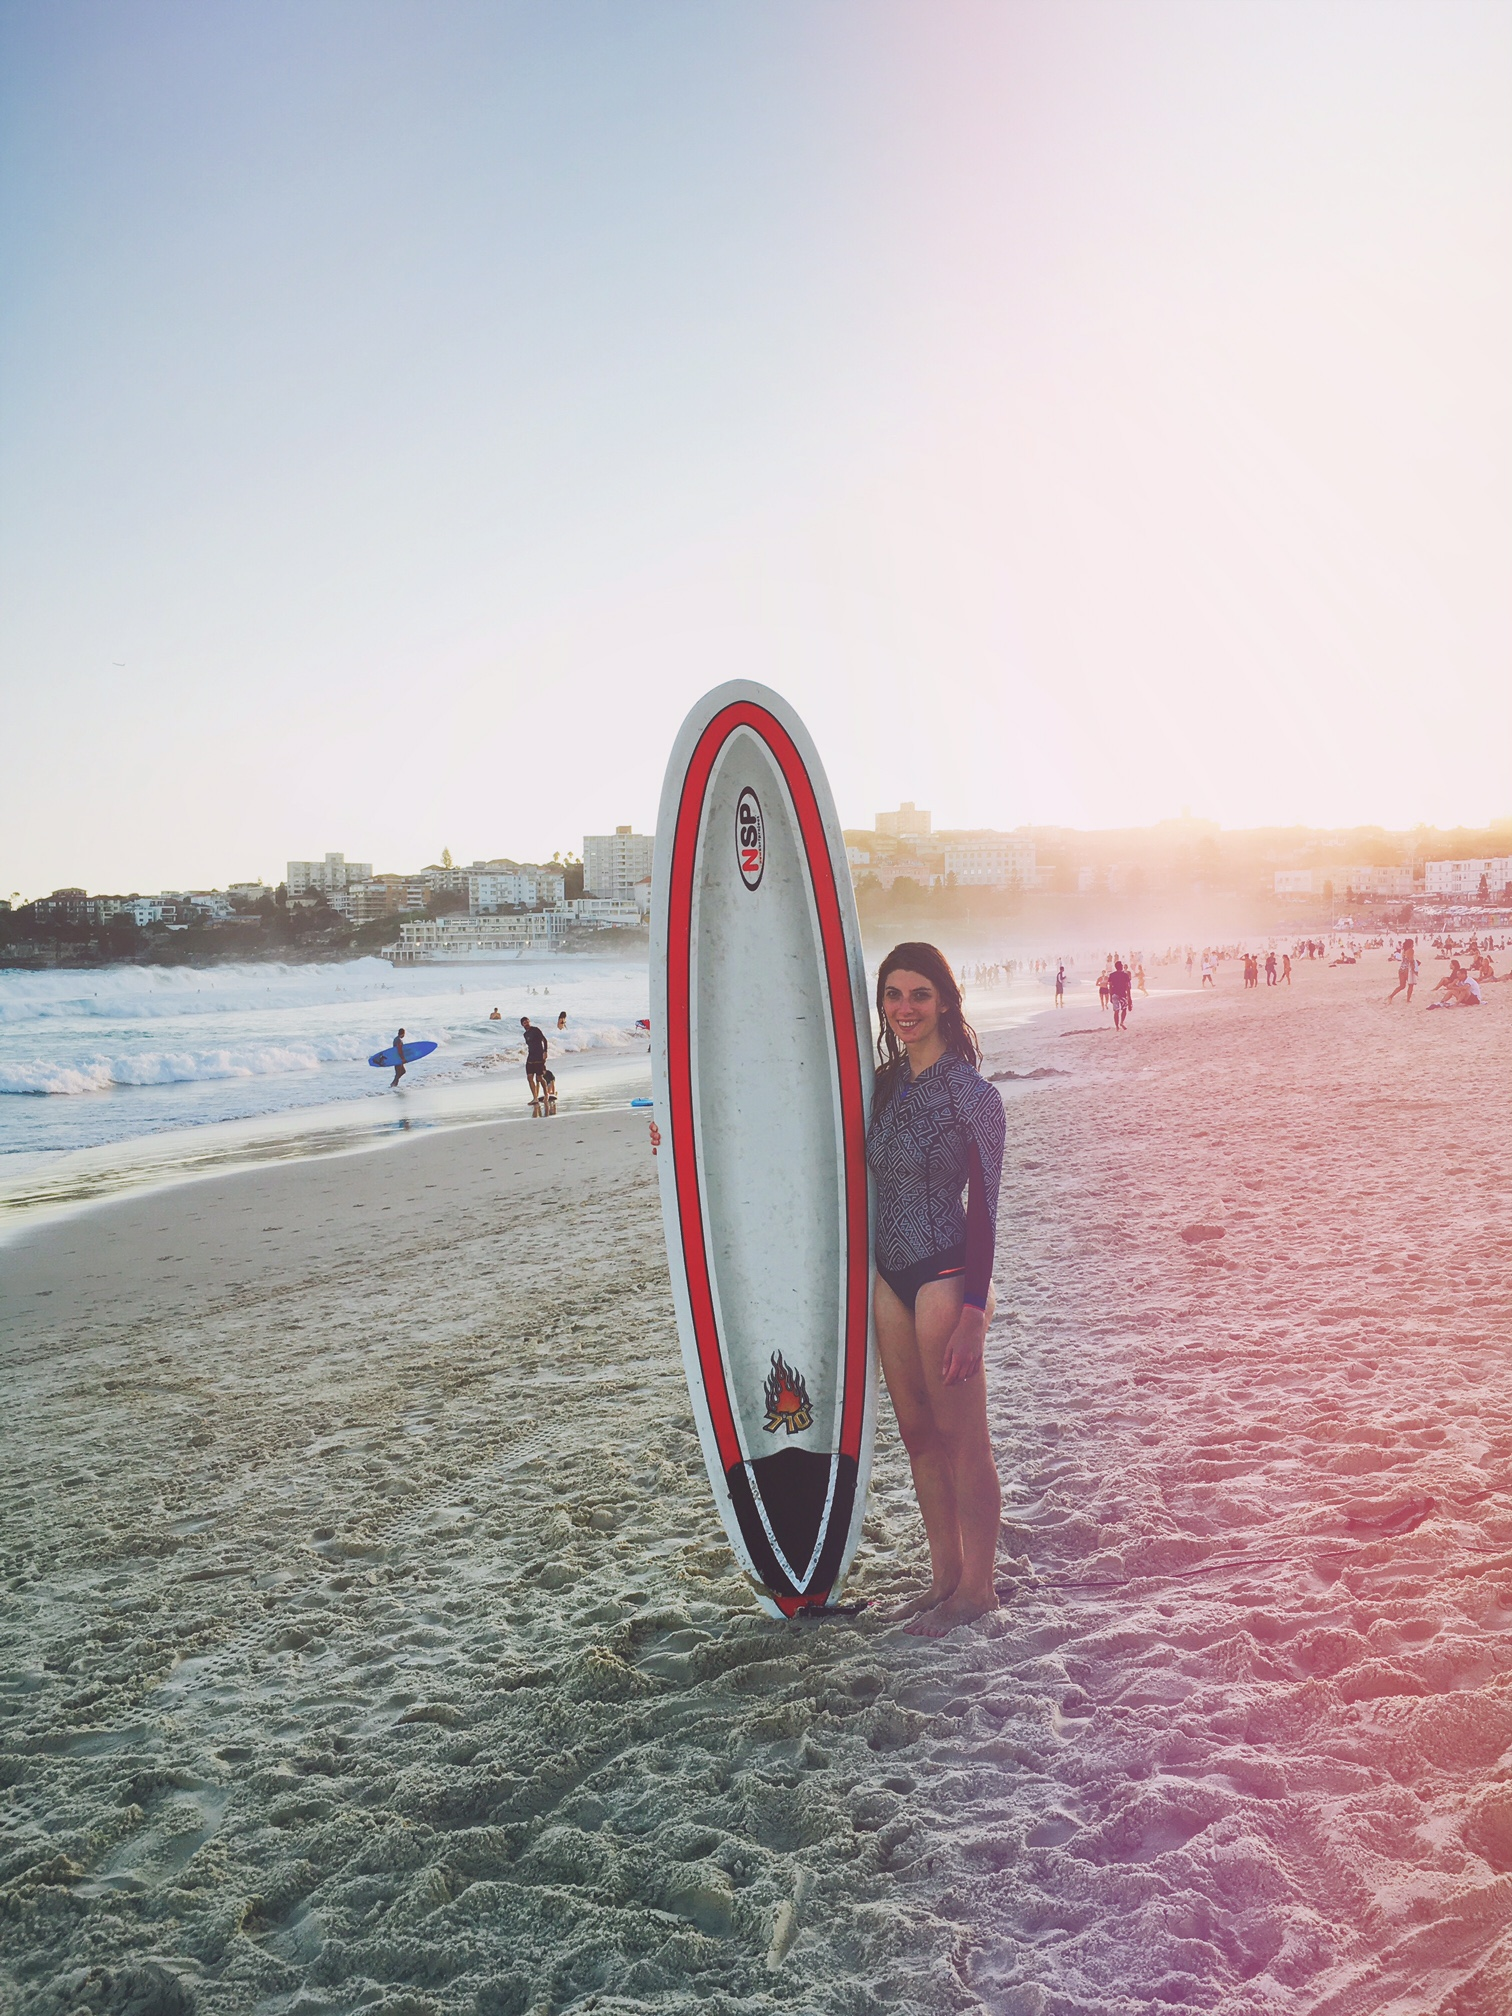 Living my surfing life in Australia at Bondi Beach